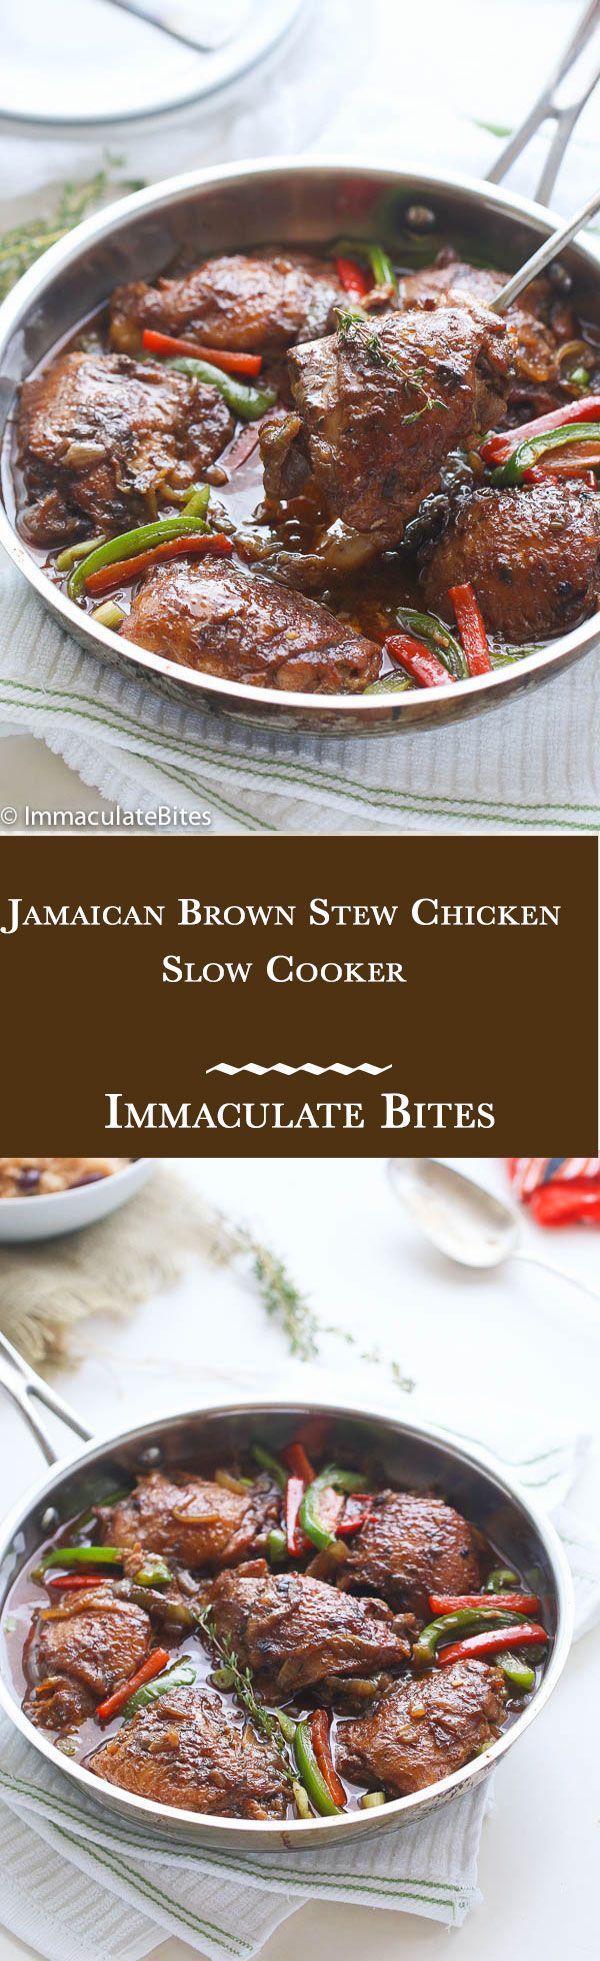 slow cooker jamaican brown stew chicken  recipe  food